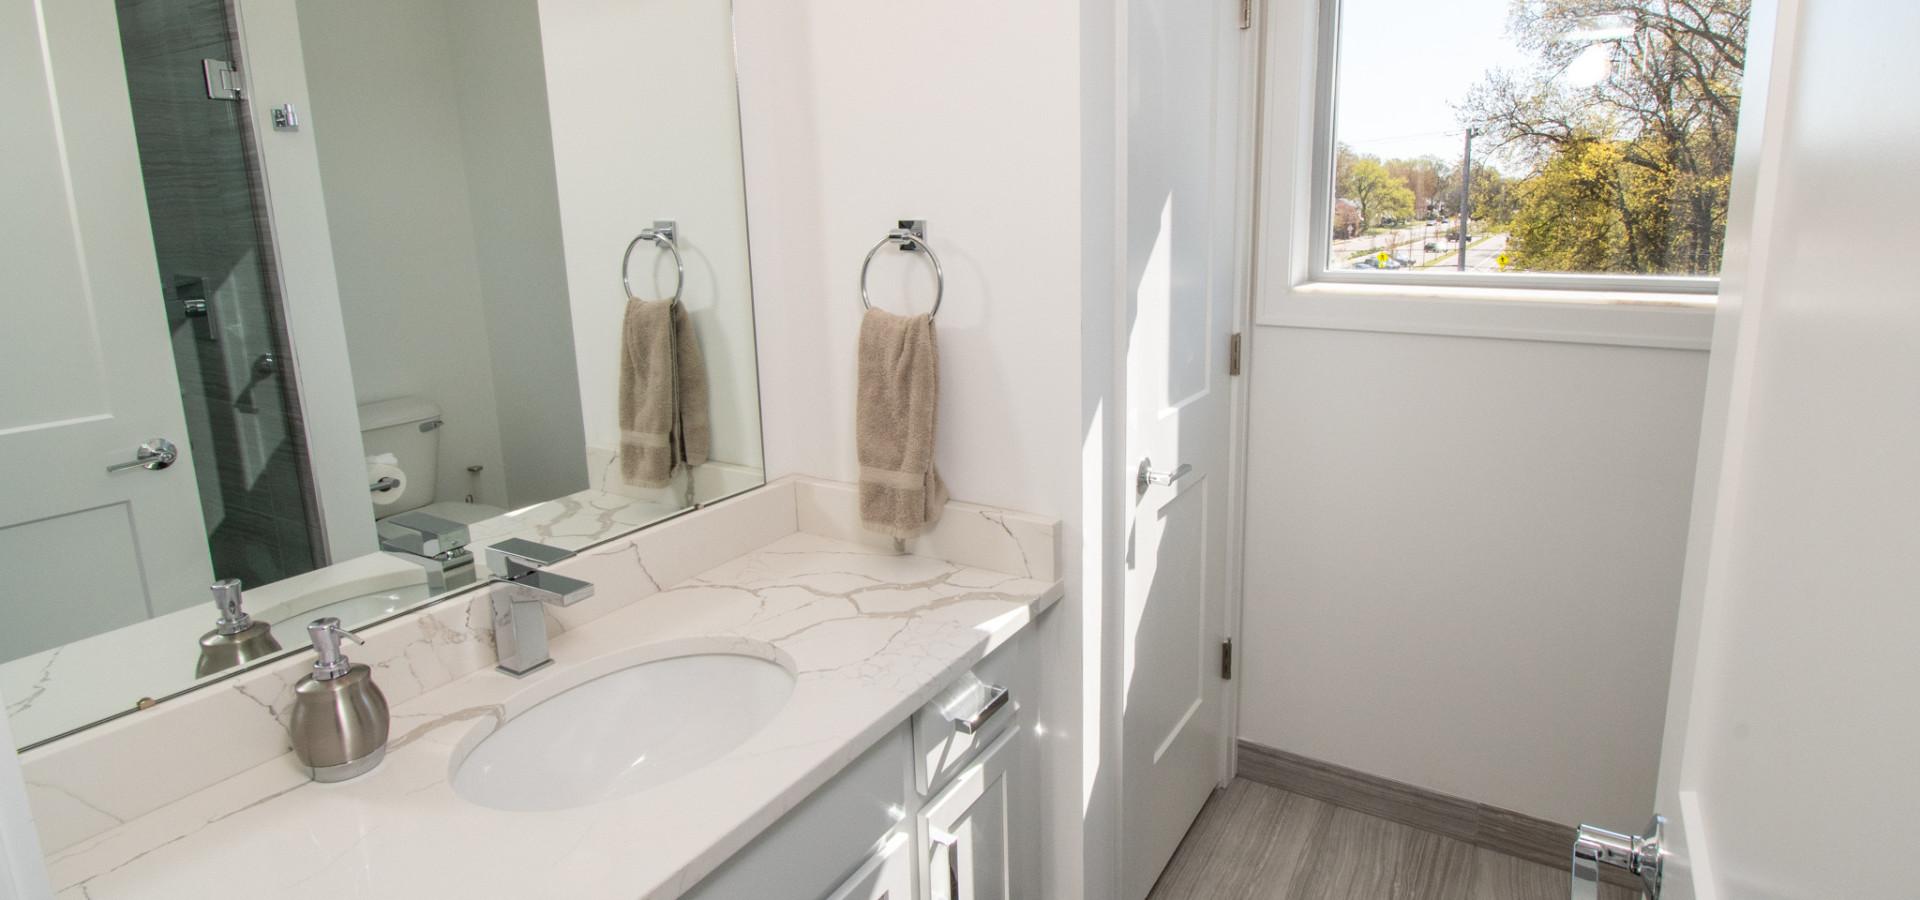 Spacious All Tile Bathrooms